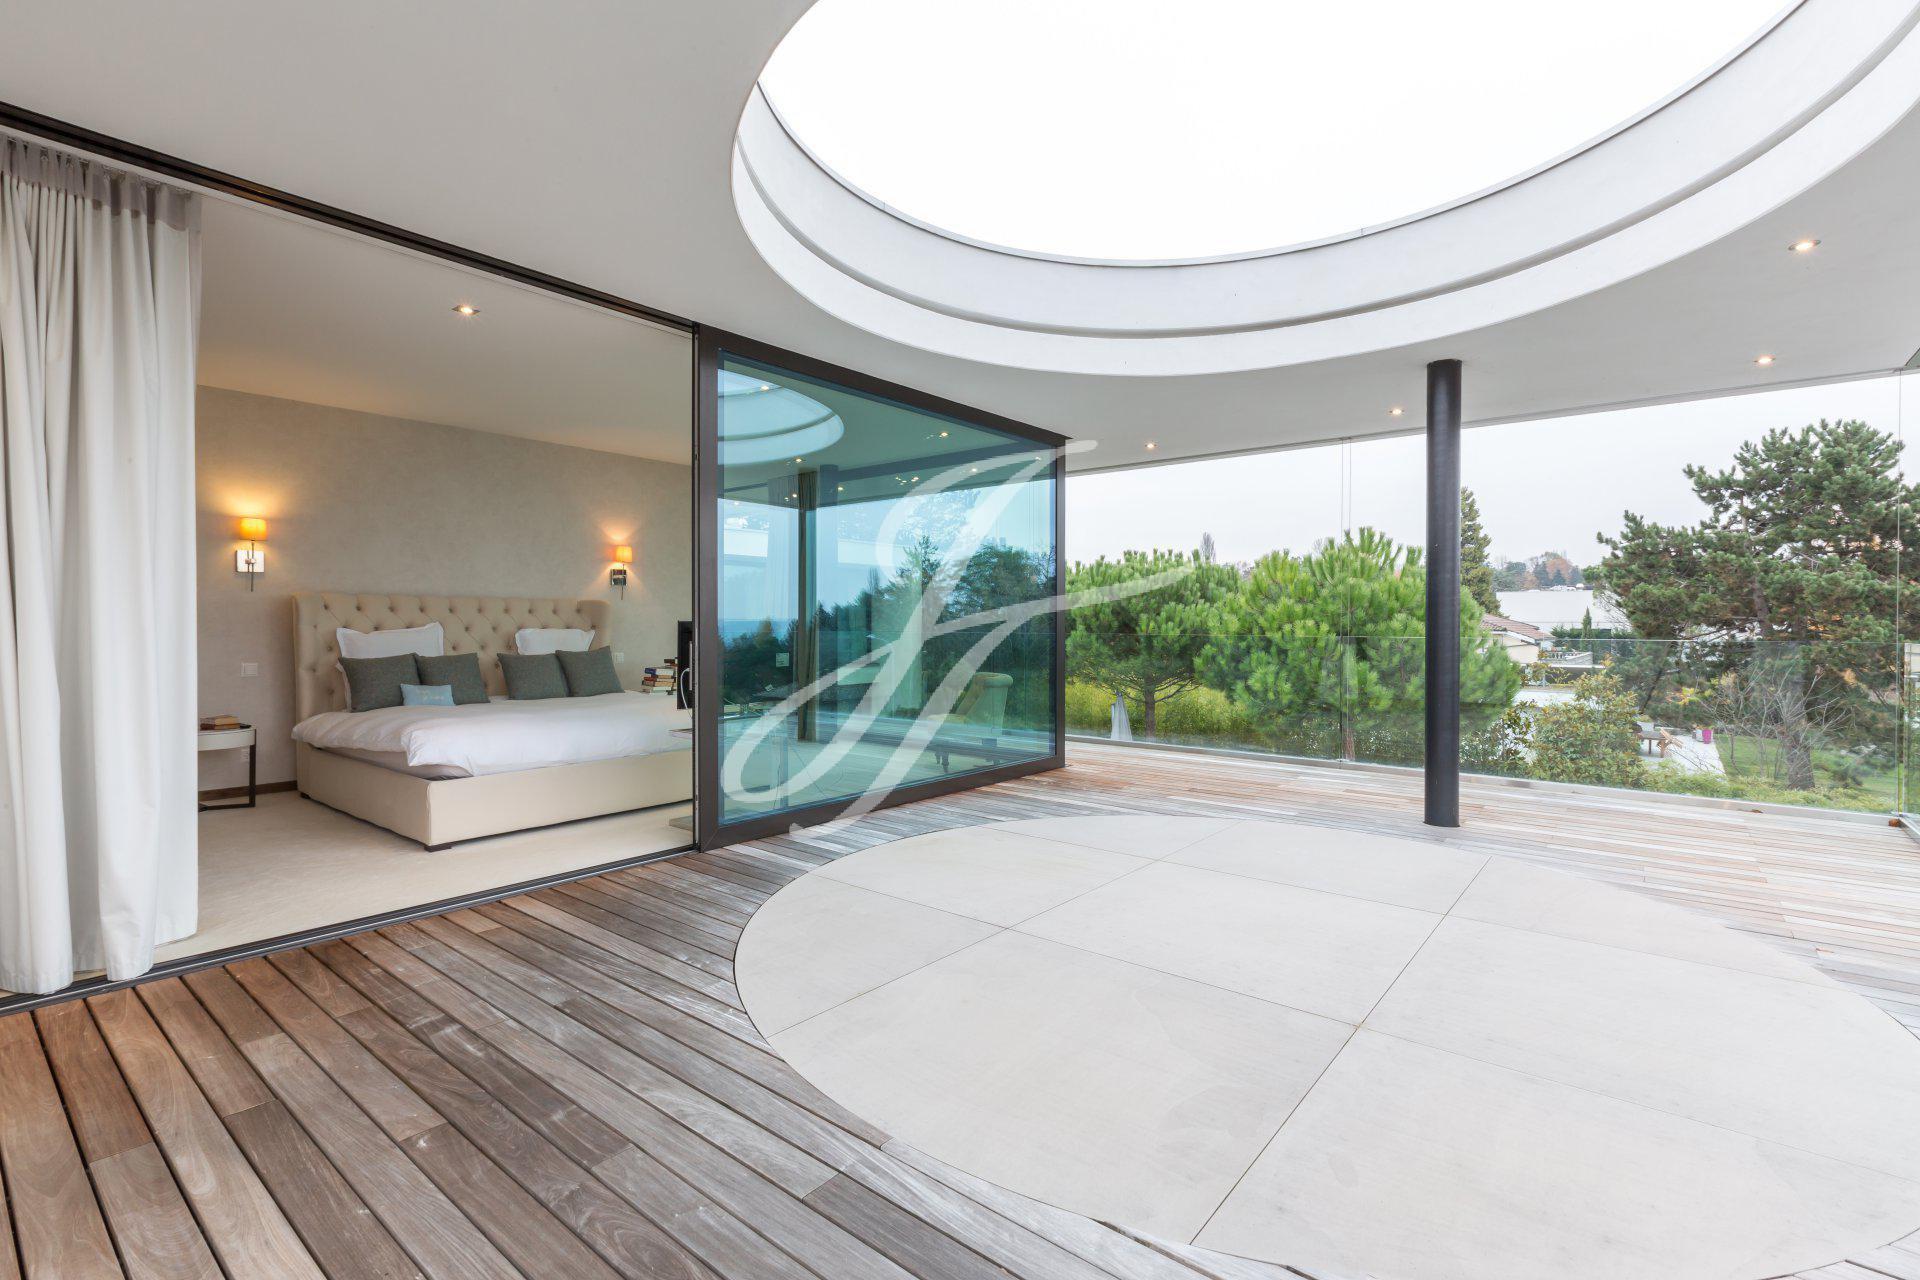 Dream villa for sale in Anières, Switzerland |FINEST RESIDENCES